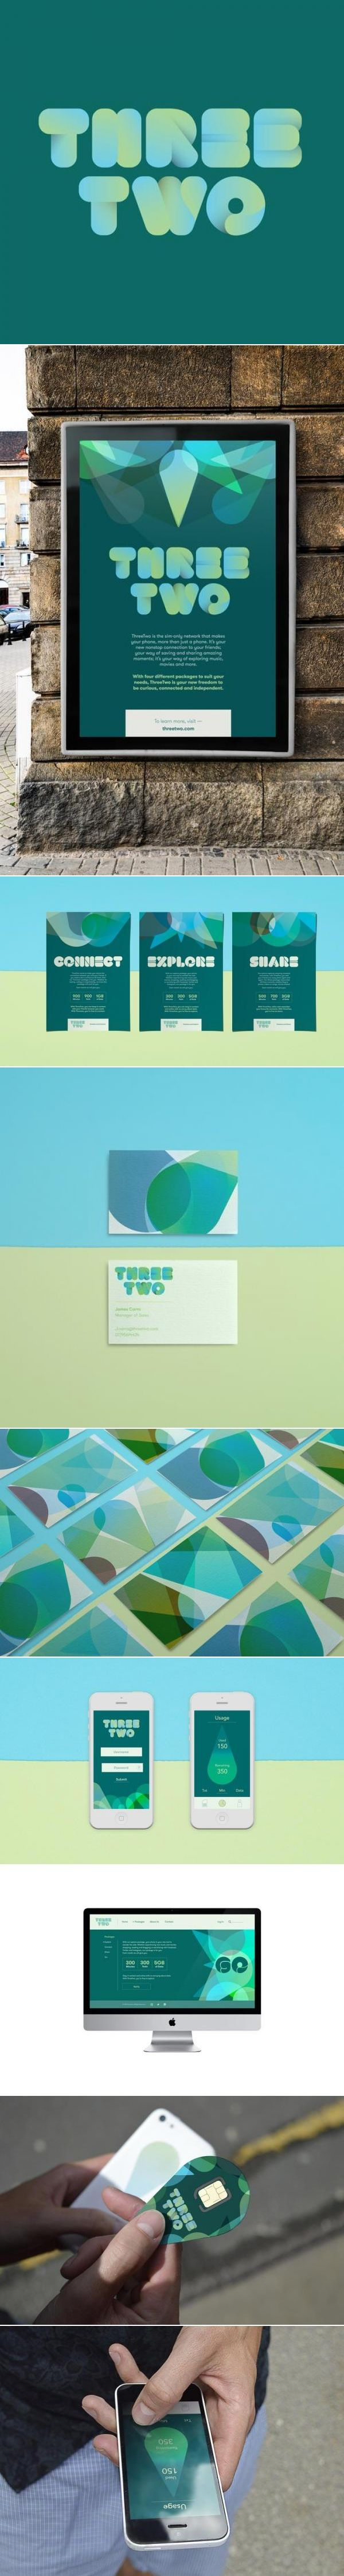 Branding by Theo Witrylak, Shillington Graduate, view his full portfolio here…